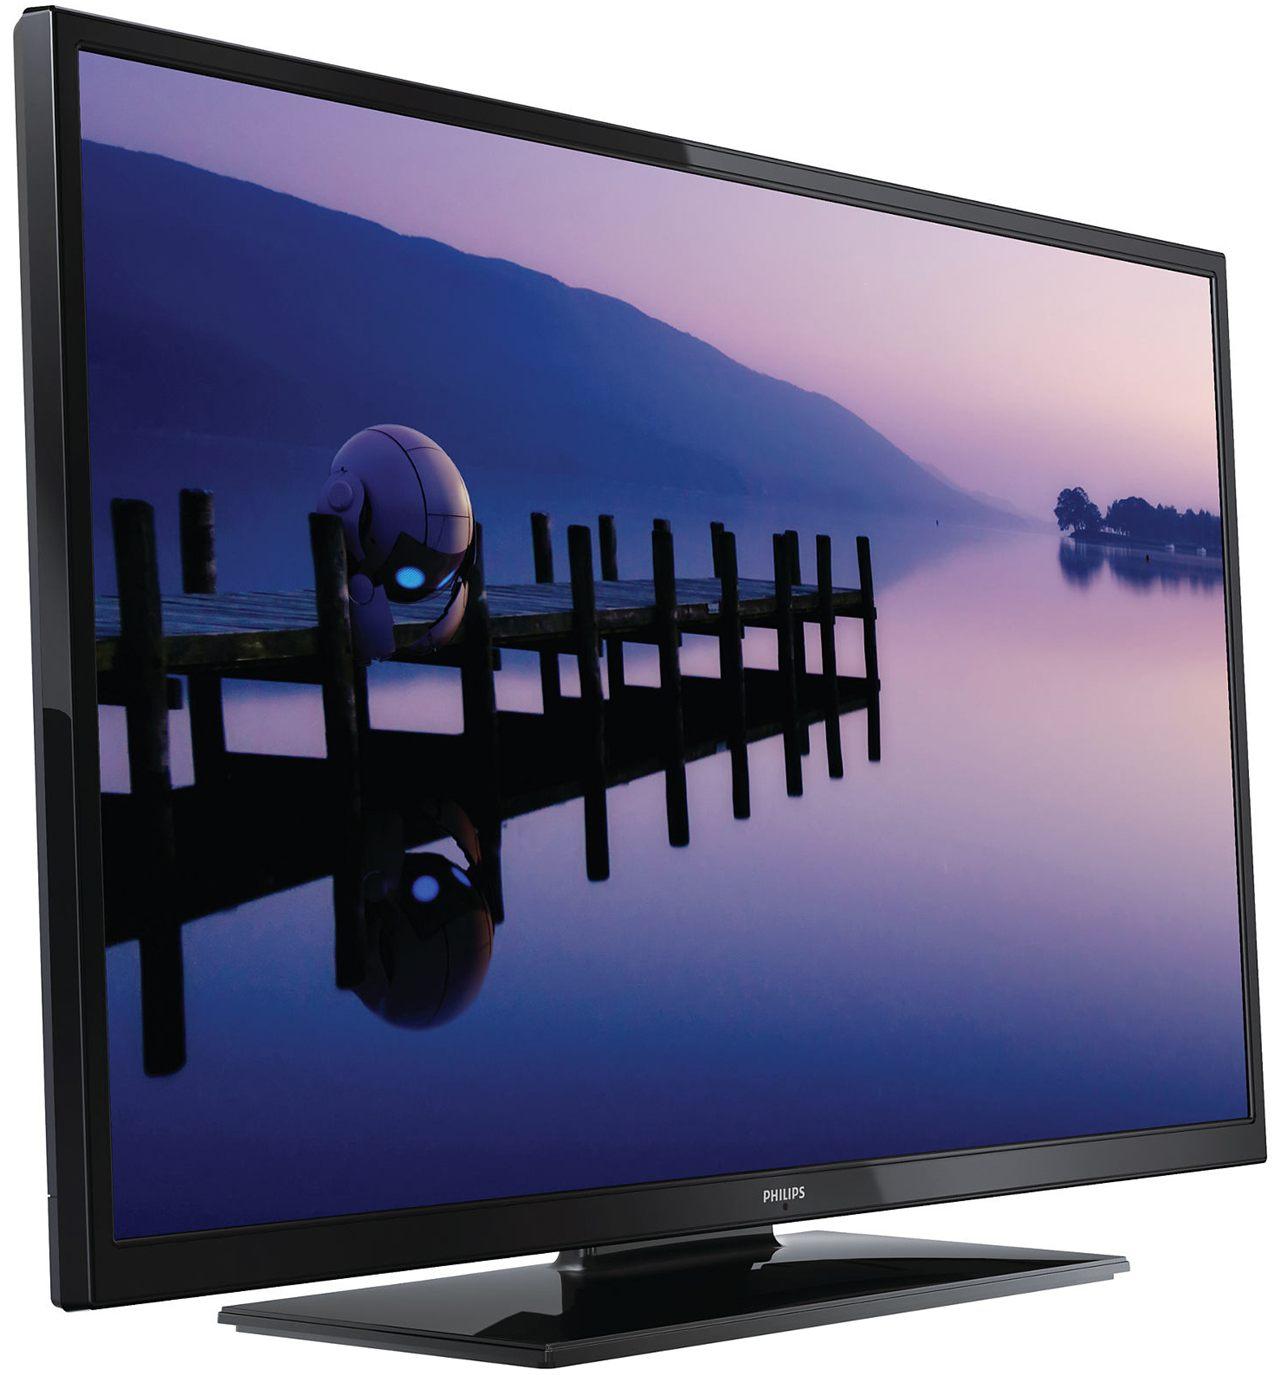 Televizor-LED-Philips-40PFL3008-102cm-Full-HD-semiprofil